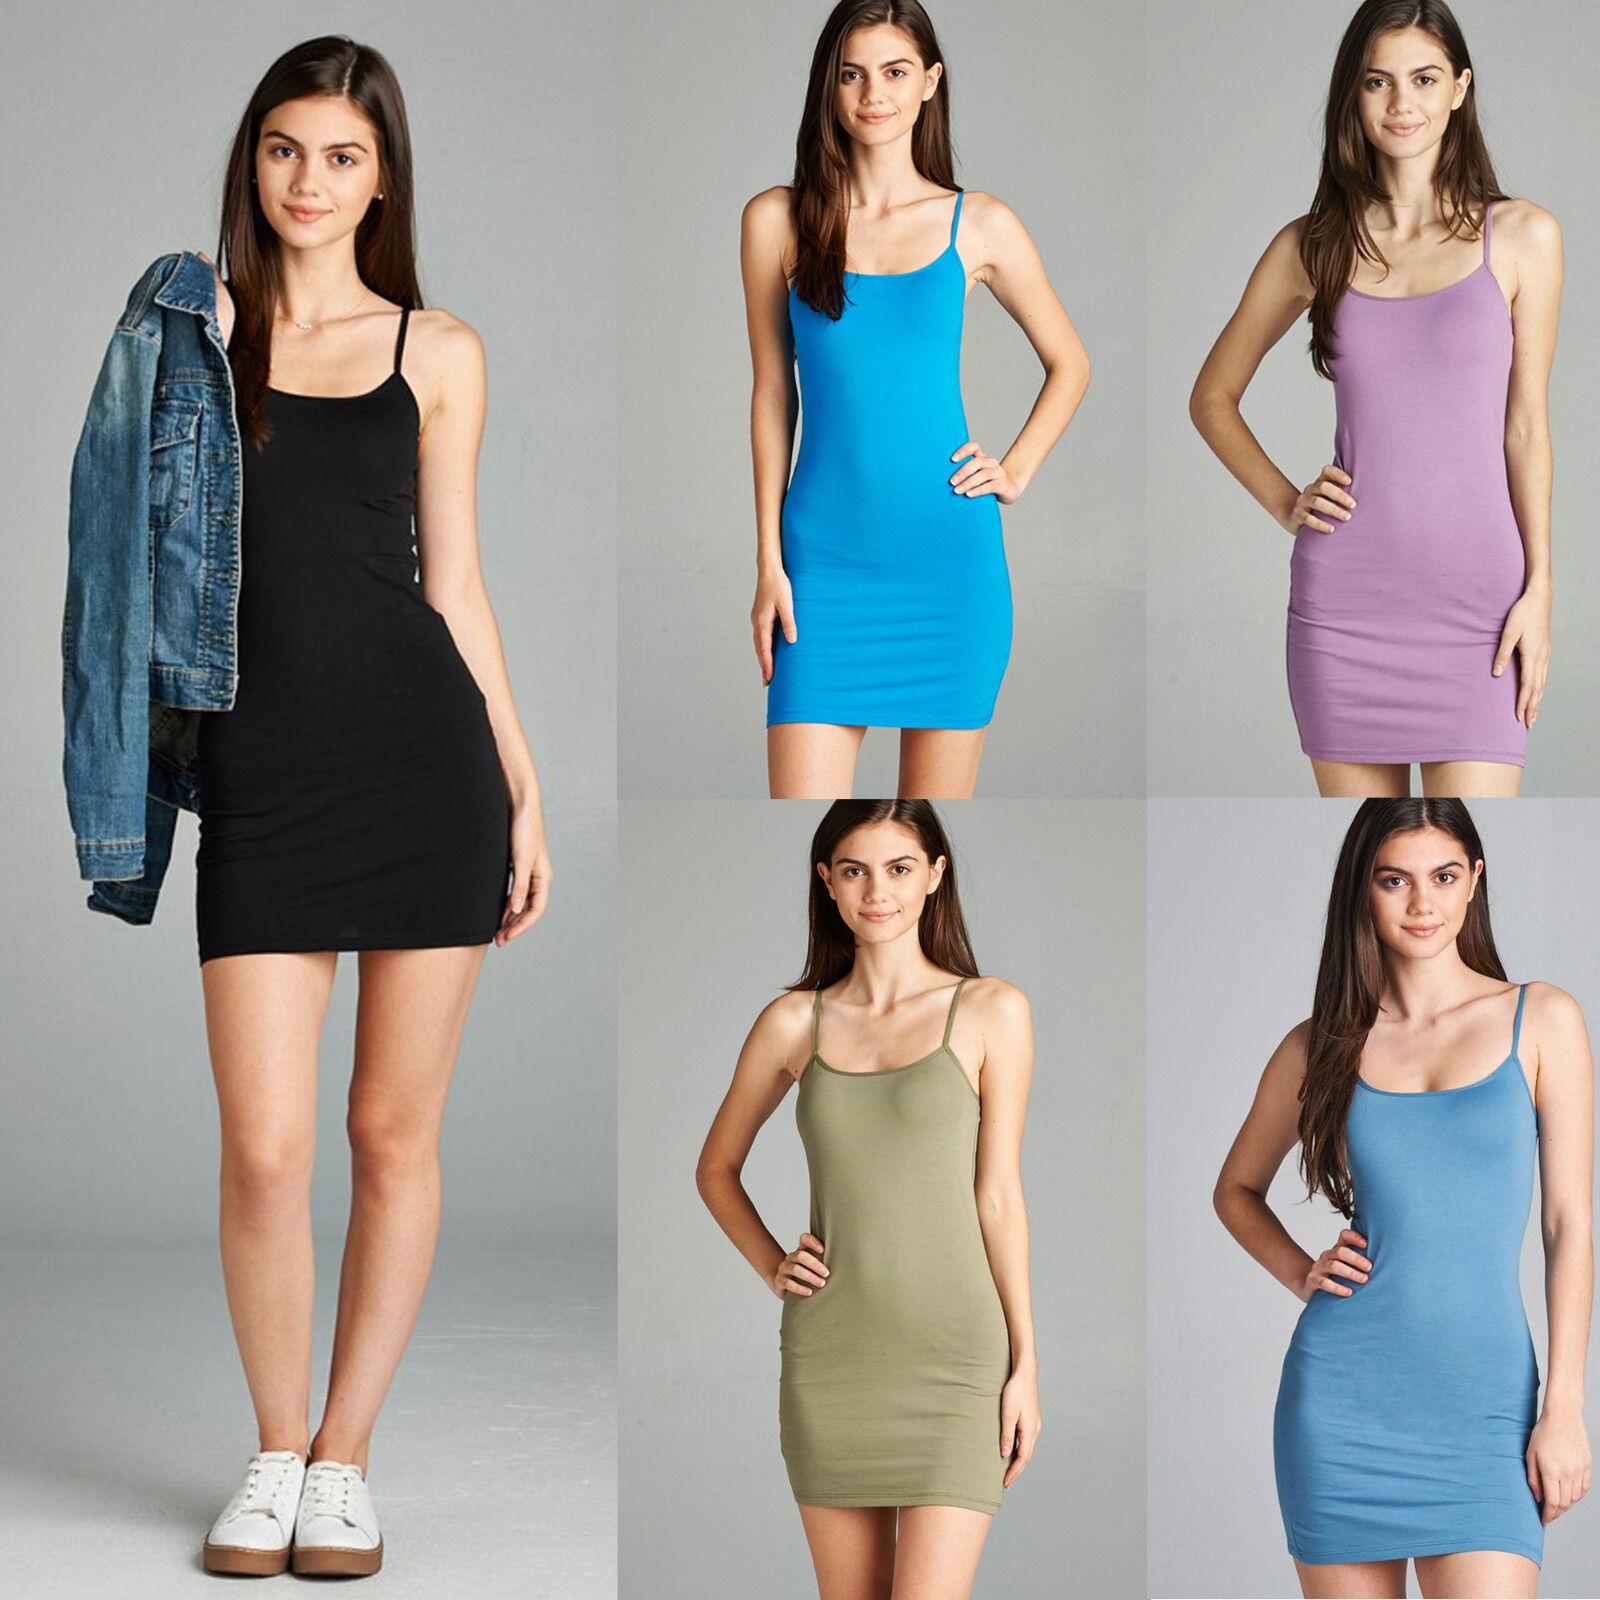 Extra Long Cotton Camisole Dress Tunic Slip Stretch Spaghetti Strap Tank Top